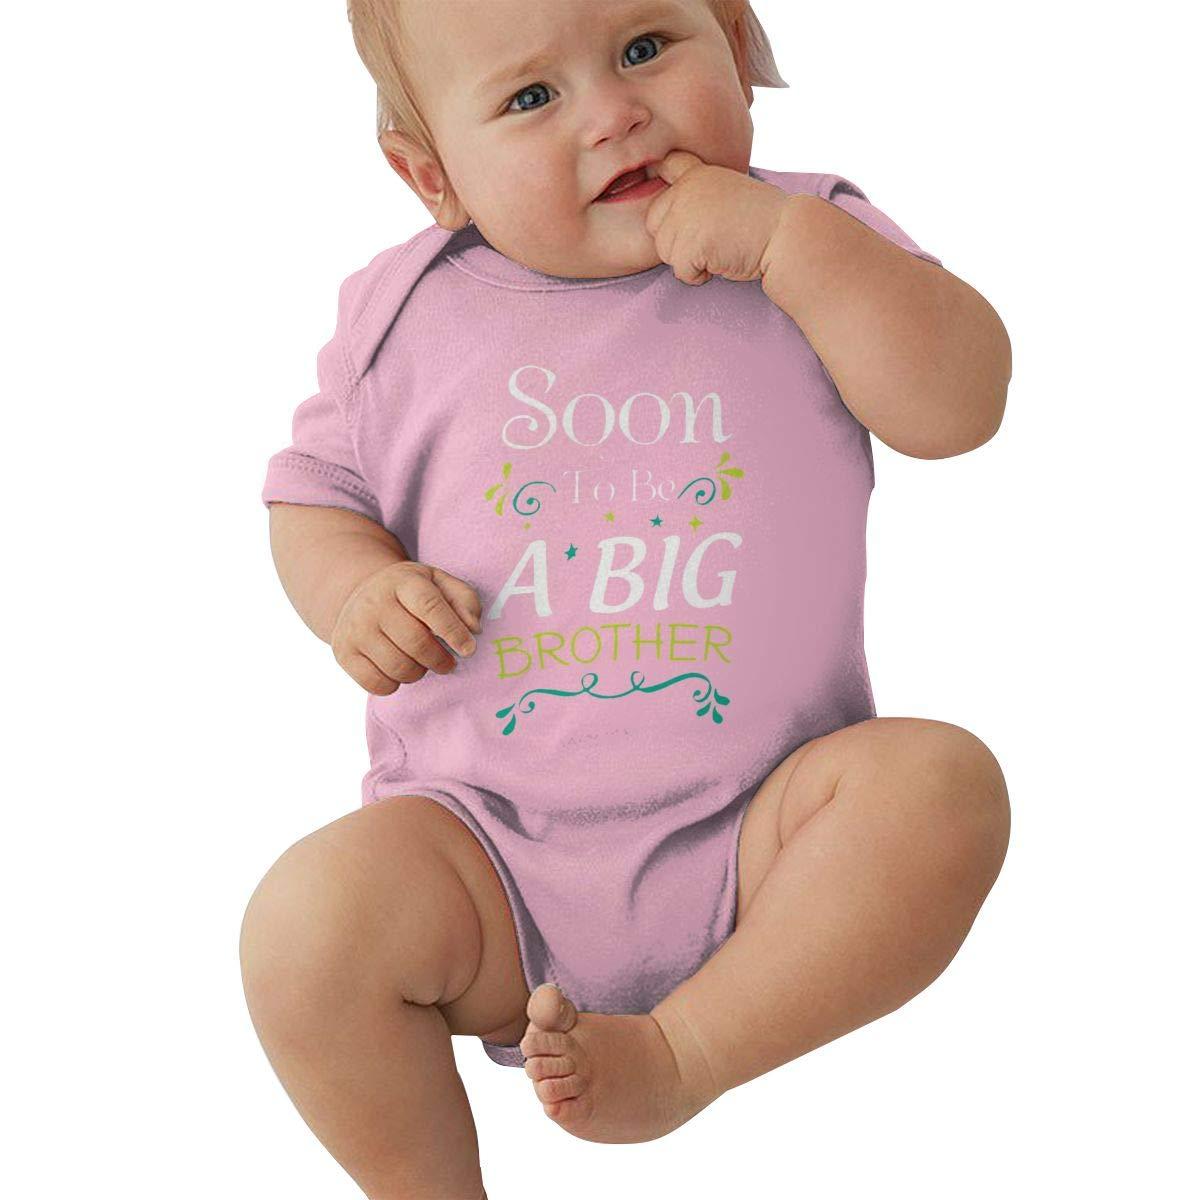 Soon to Be Big Brother Fashion Newborn Baby Short Sleeve Bodysuit Romper Infant Summer Clothing Black